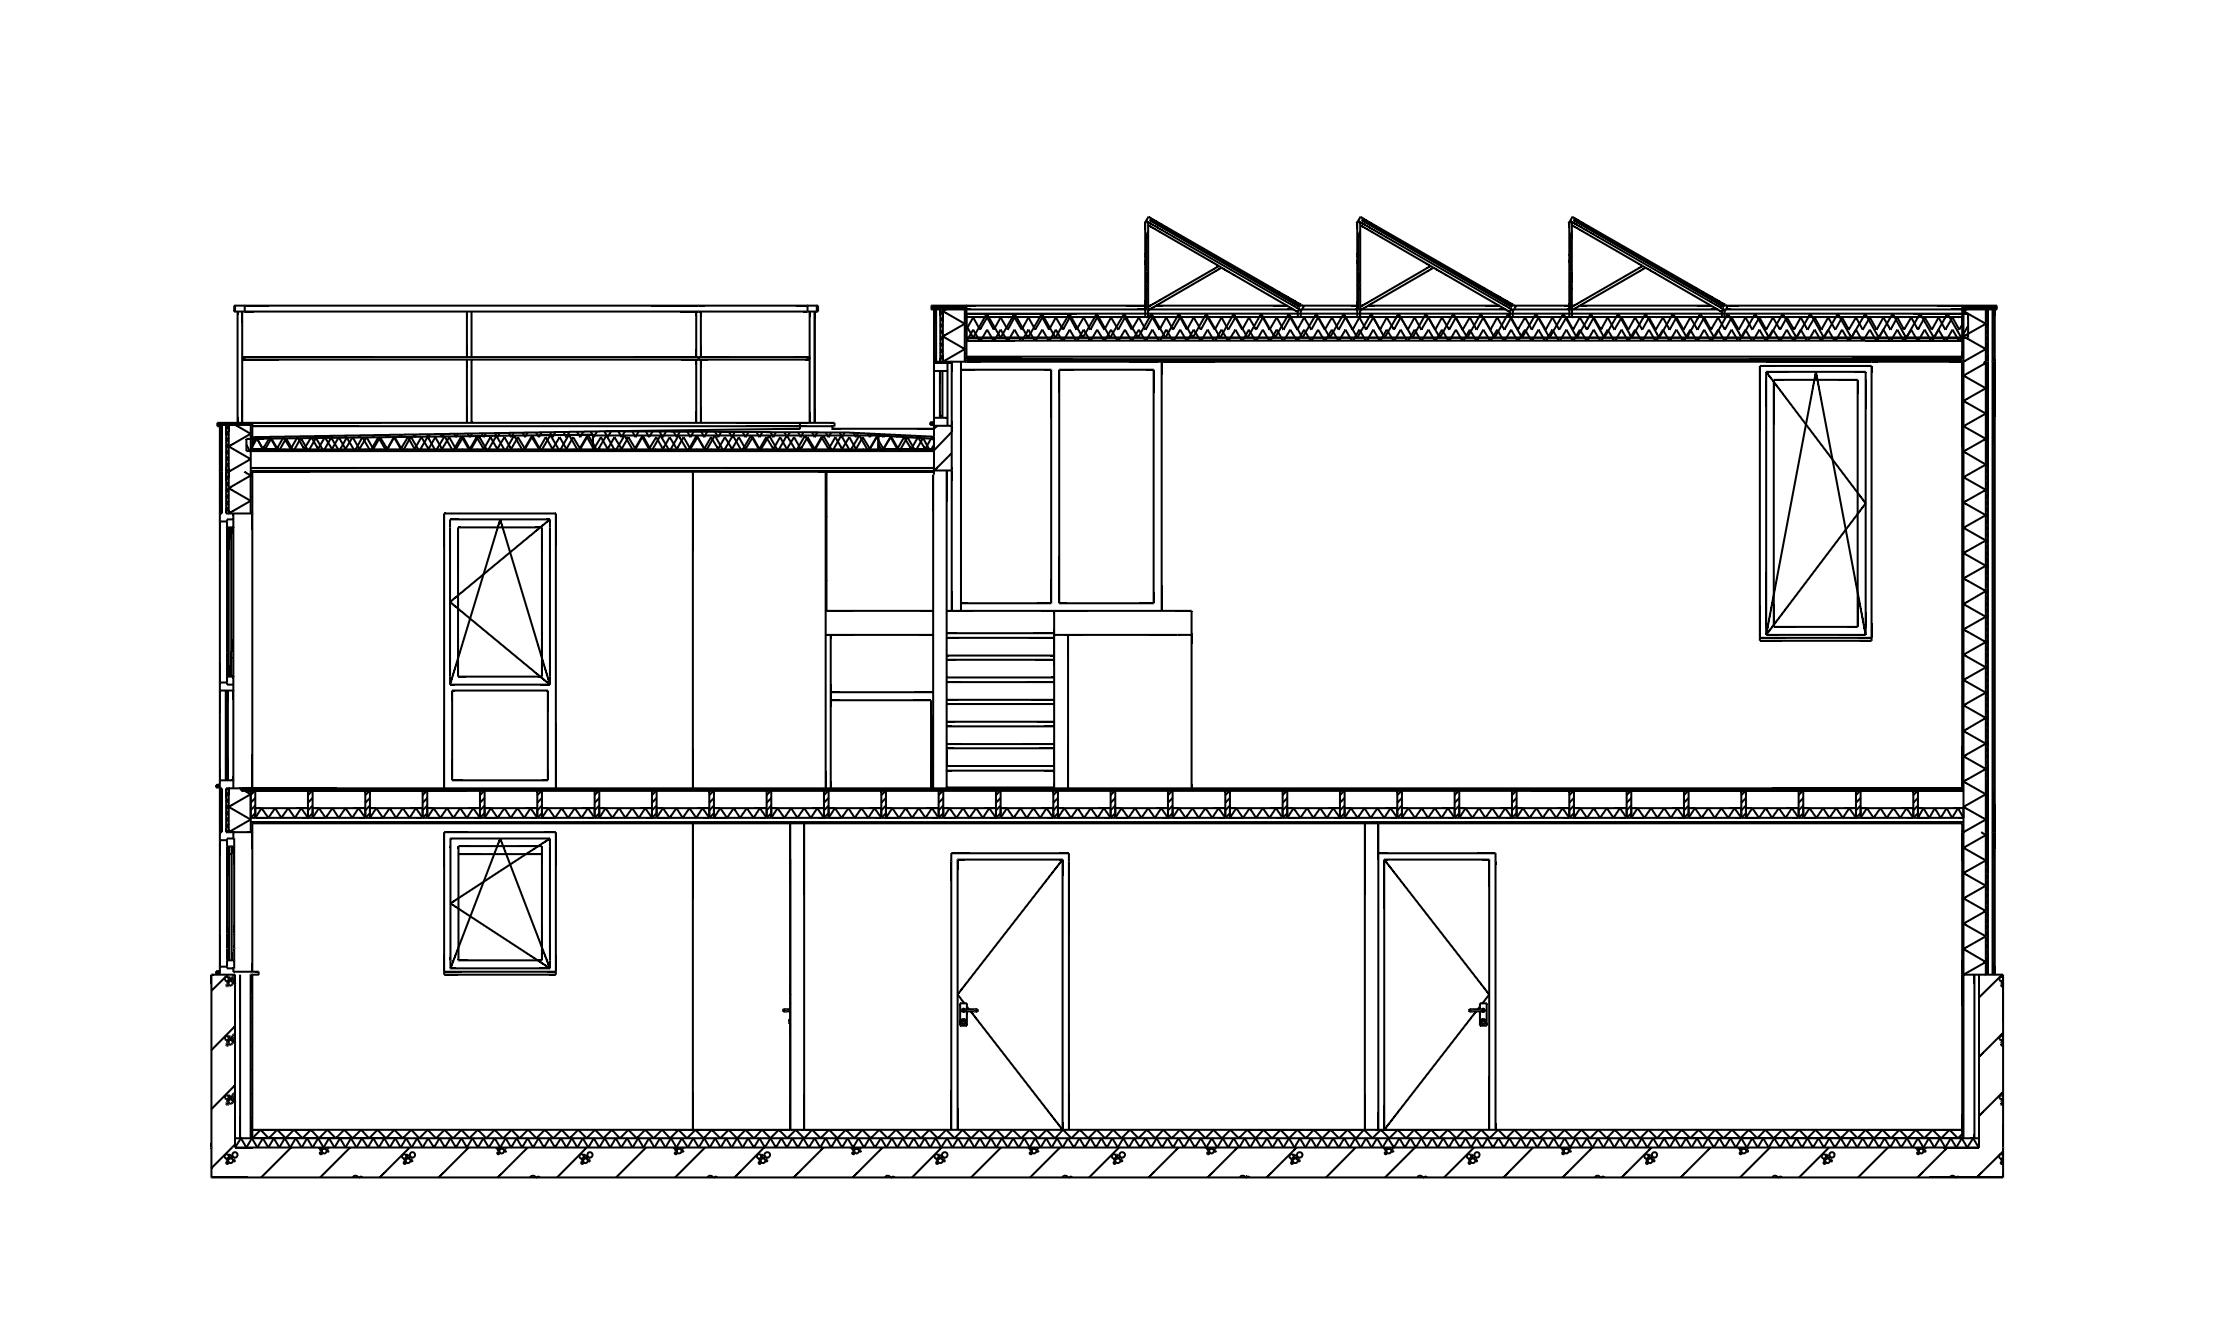 Waterkavels Moestuinlaan woonark woonboot MTB architecten waterwoning